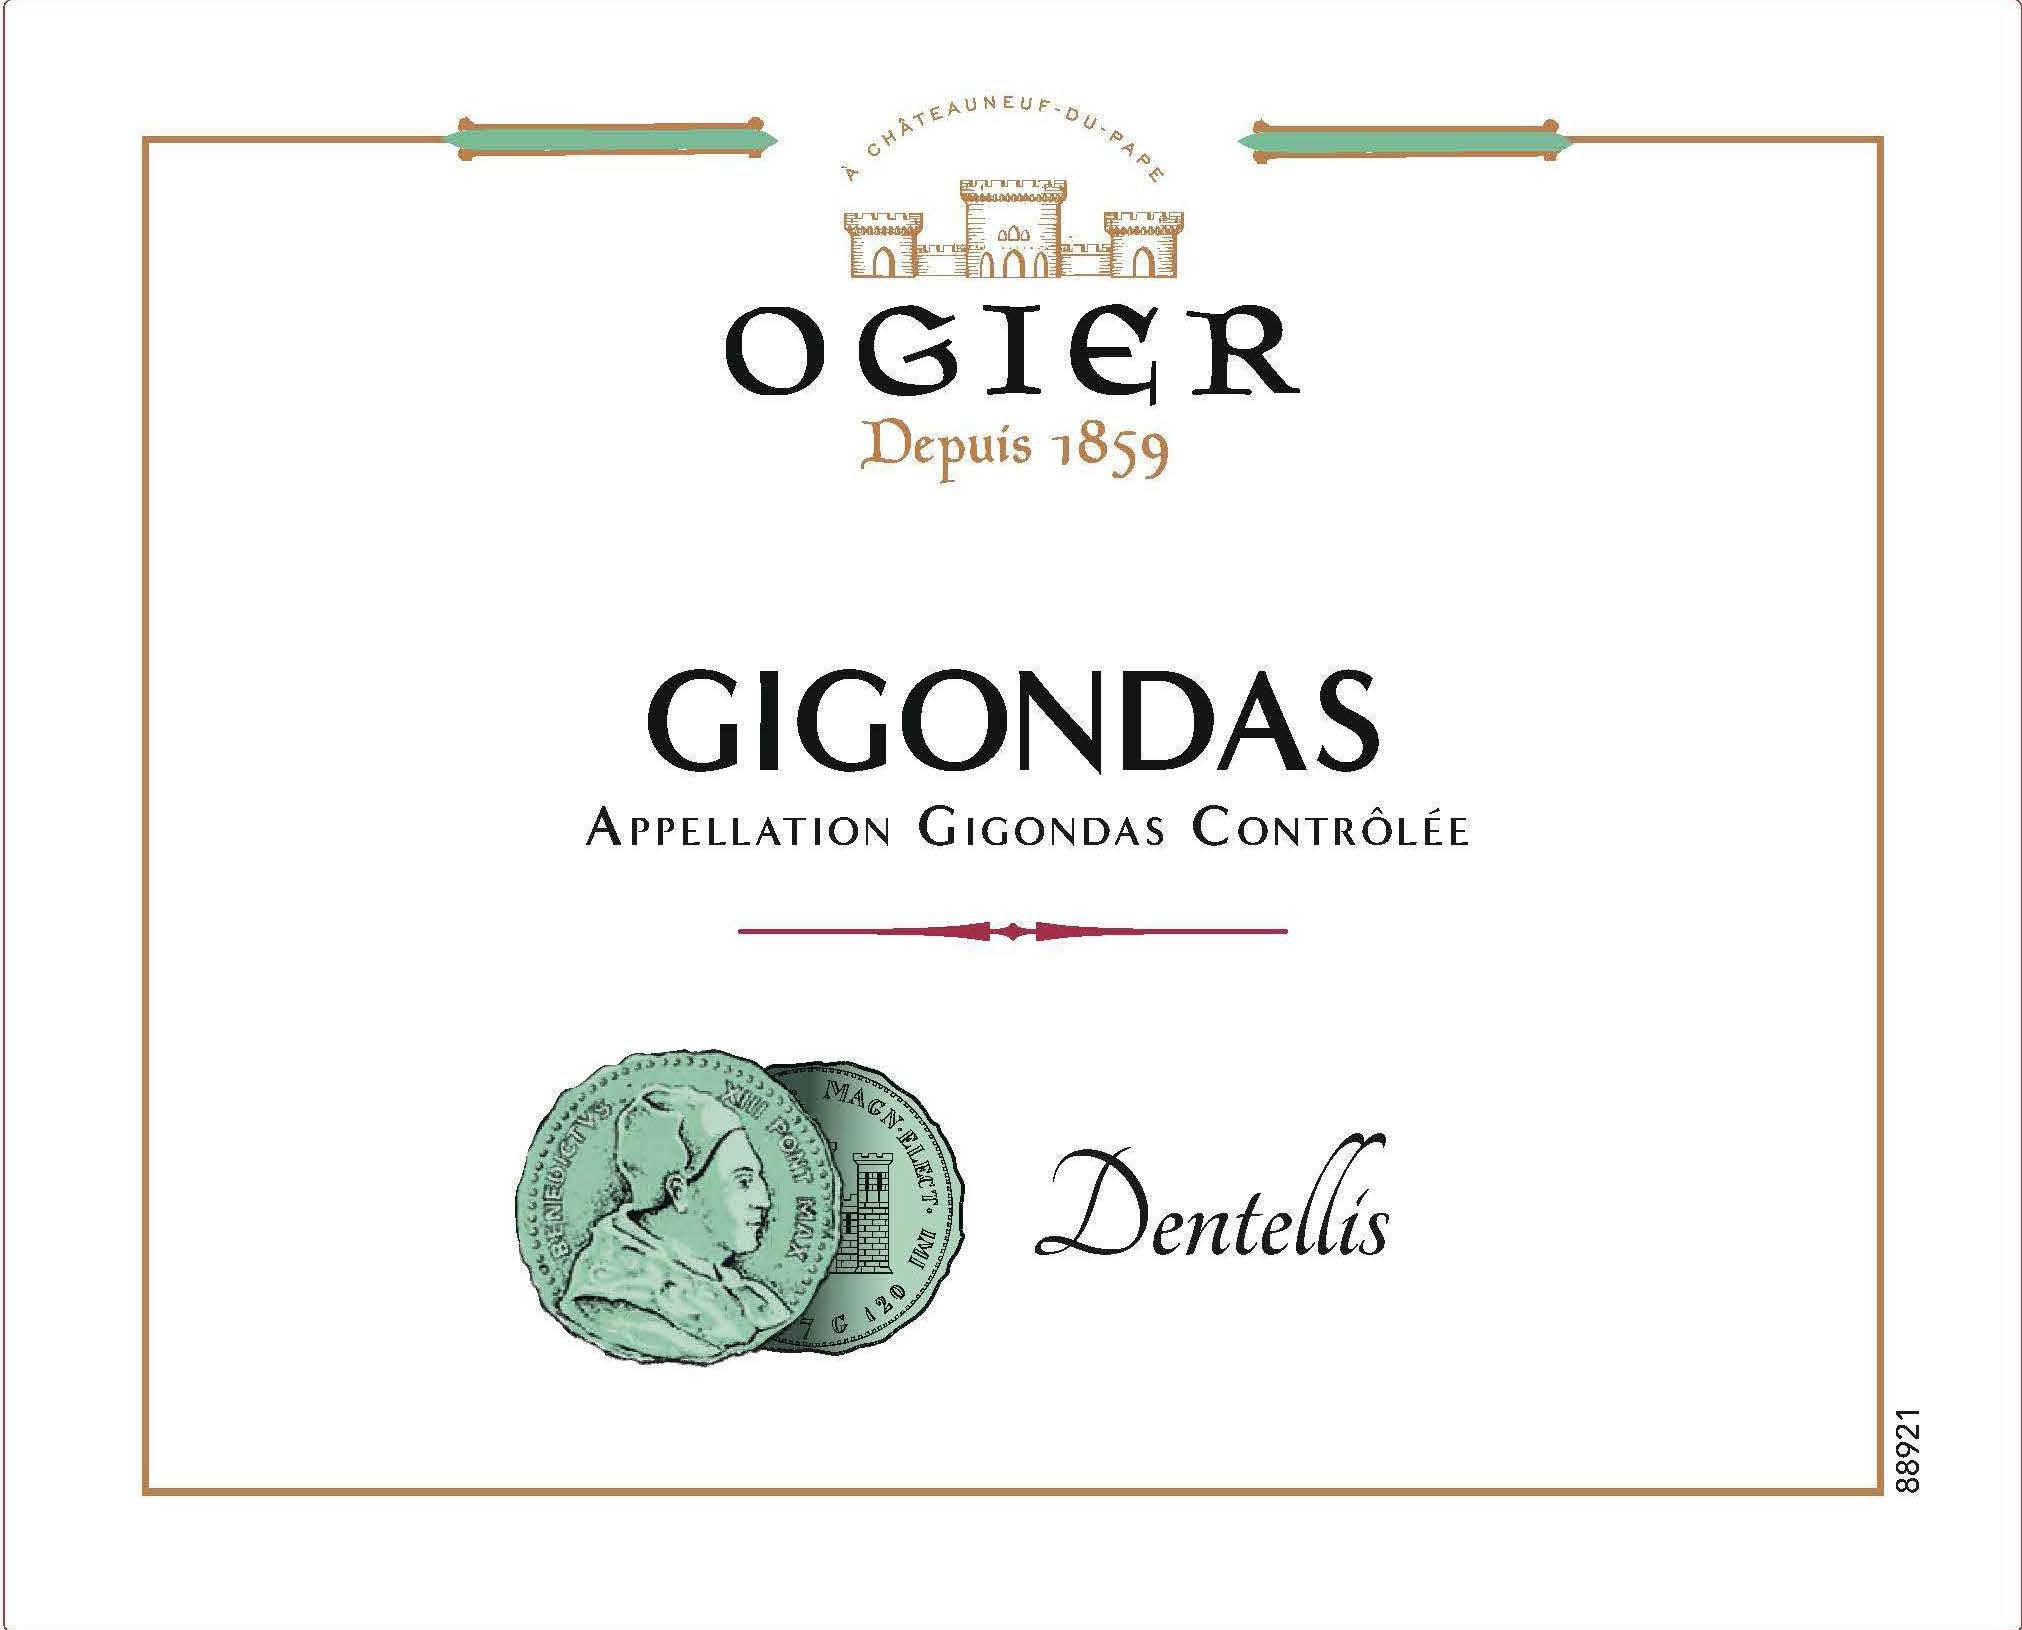 Ogier - Dentellis - Gigondas label